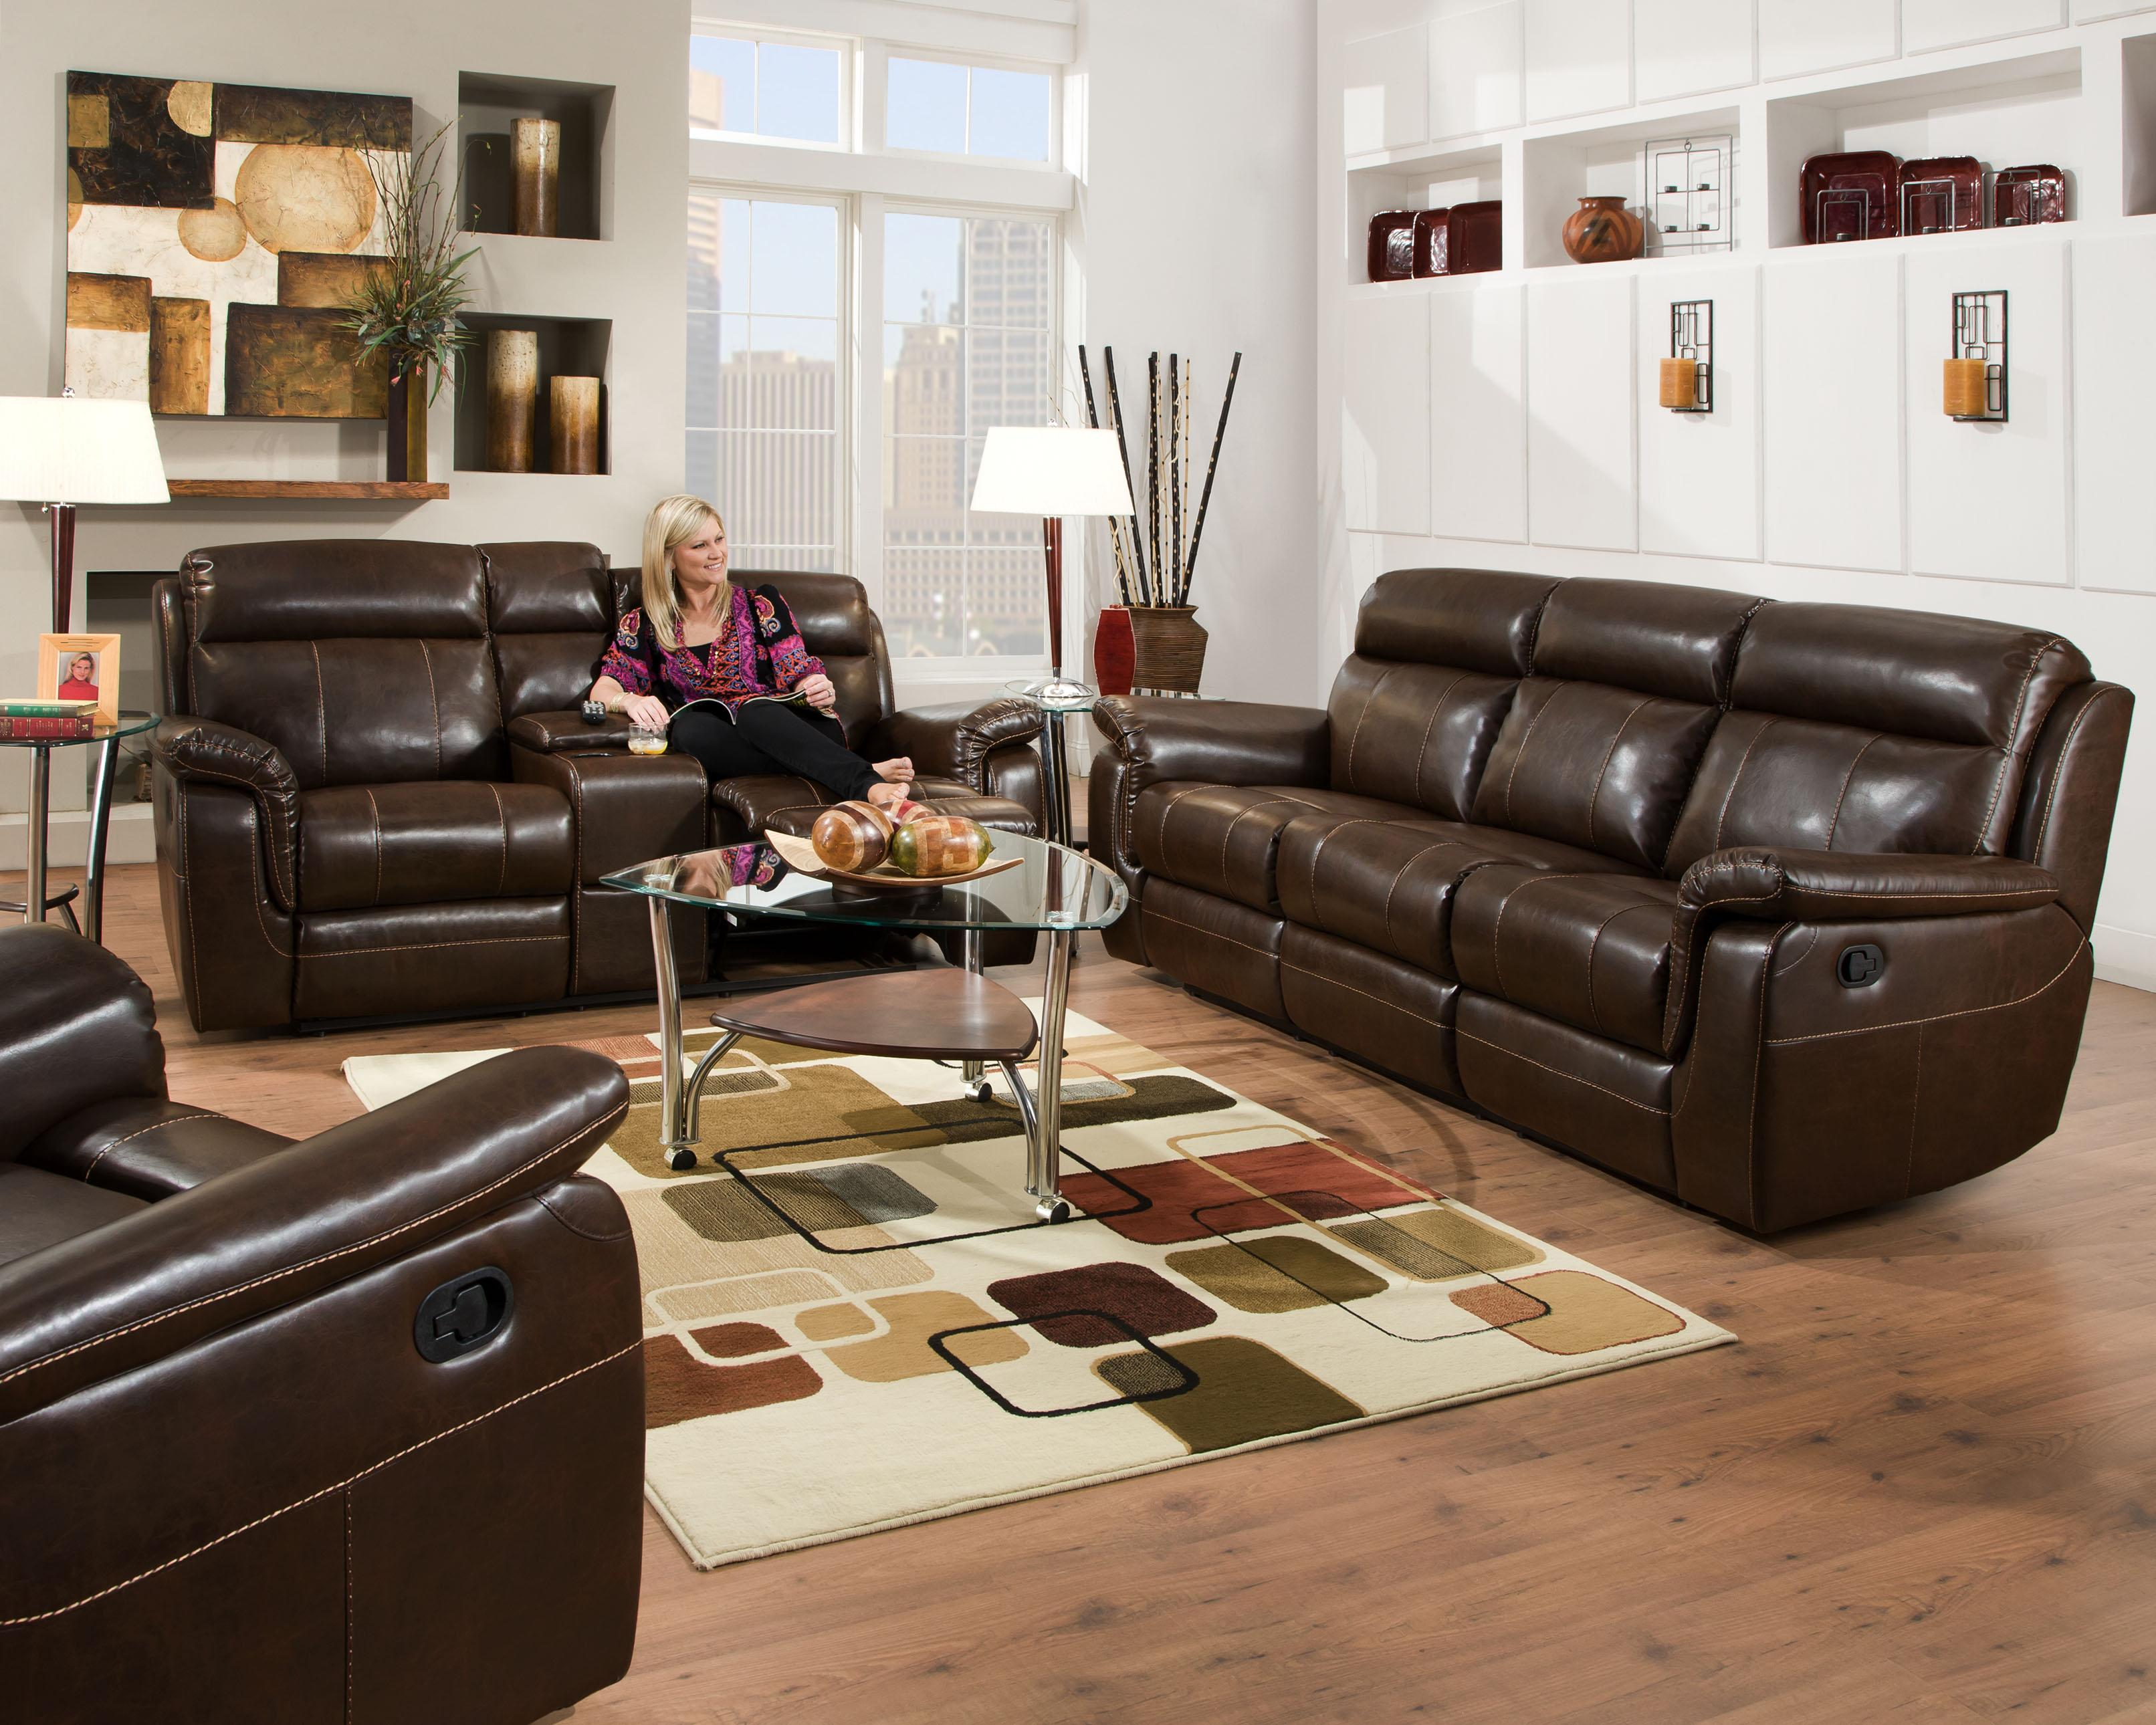 862 862 by corinthian j j furniture corinthian 862 for J furniture dealers